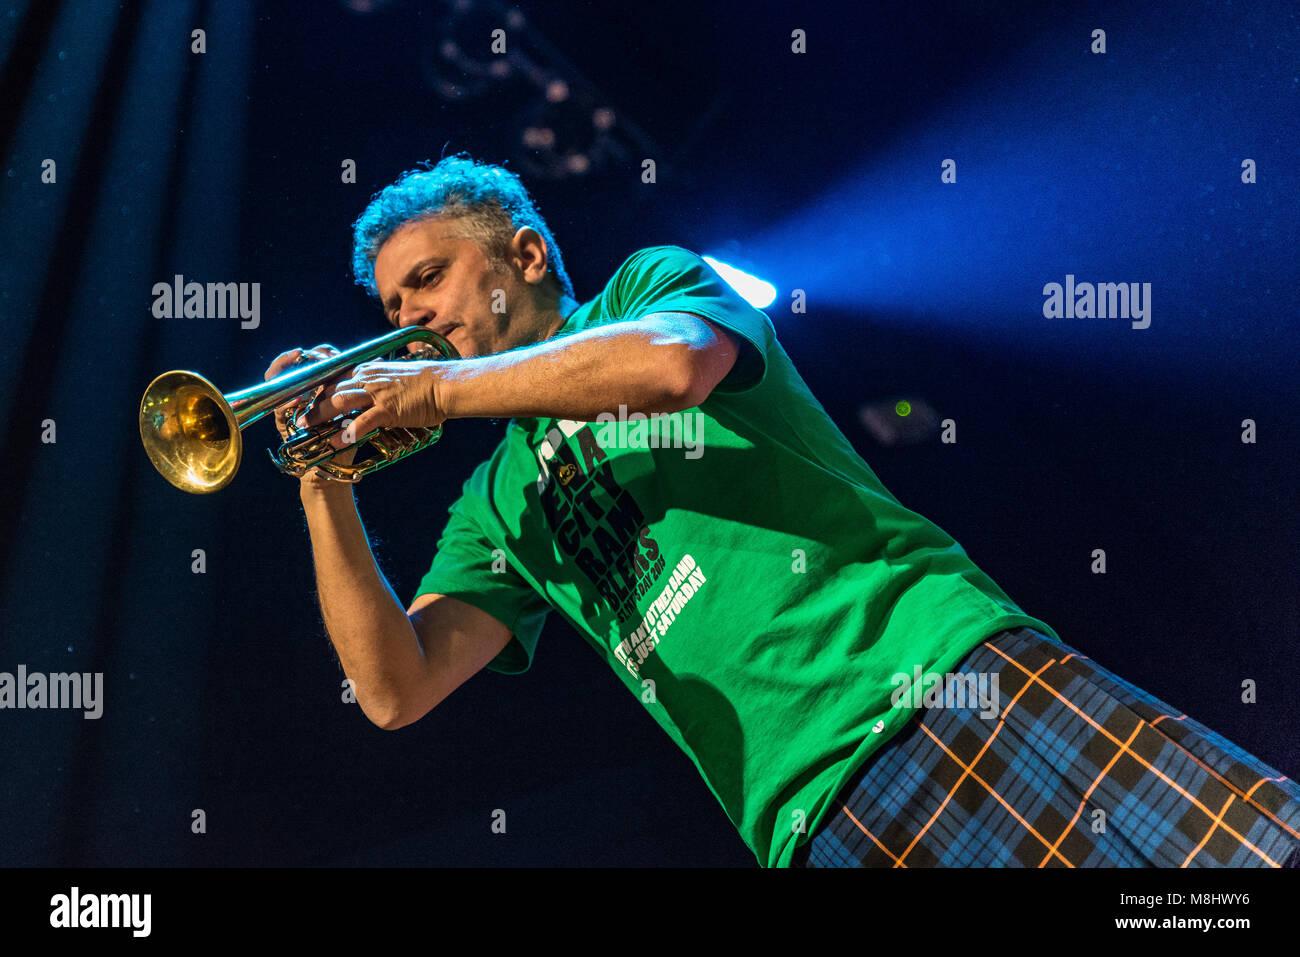 Milan, Italy. 16 March 2018. Italian folk rock band Modena City Ramblers performs at Live Music Club. Brambilla - Stock Image